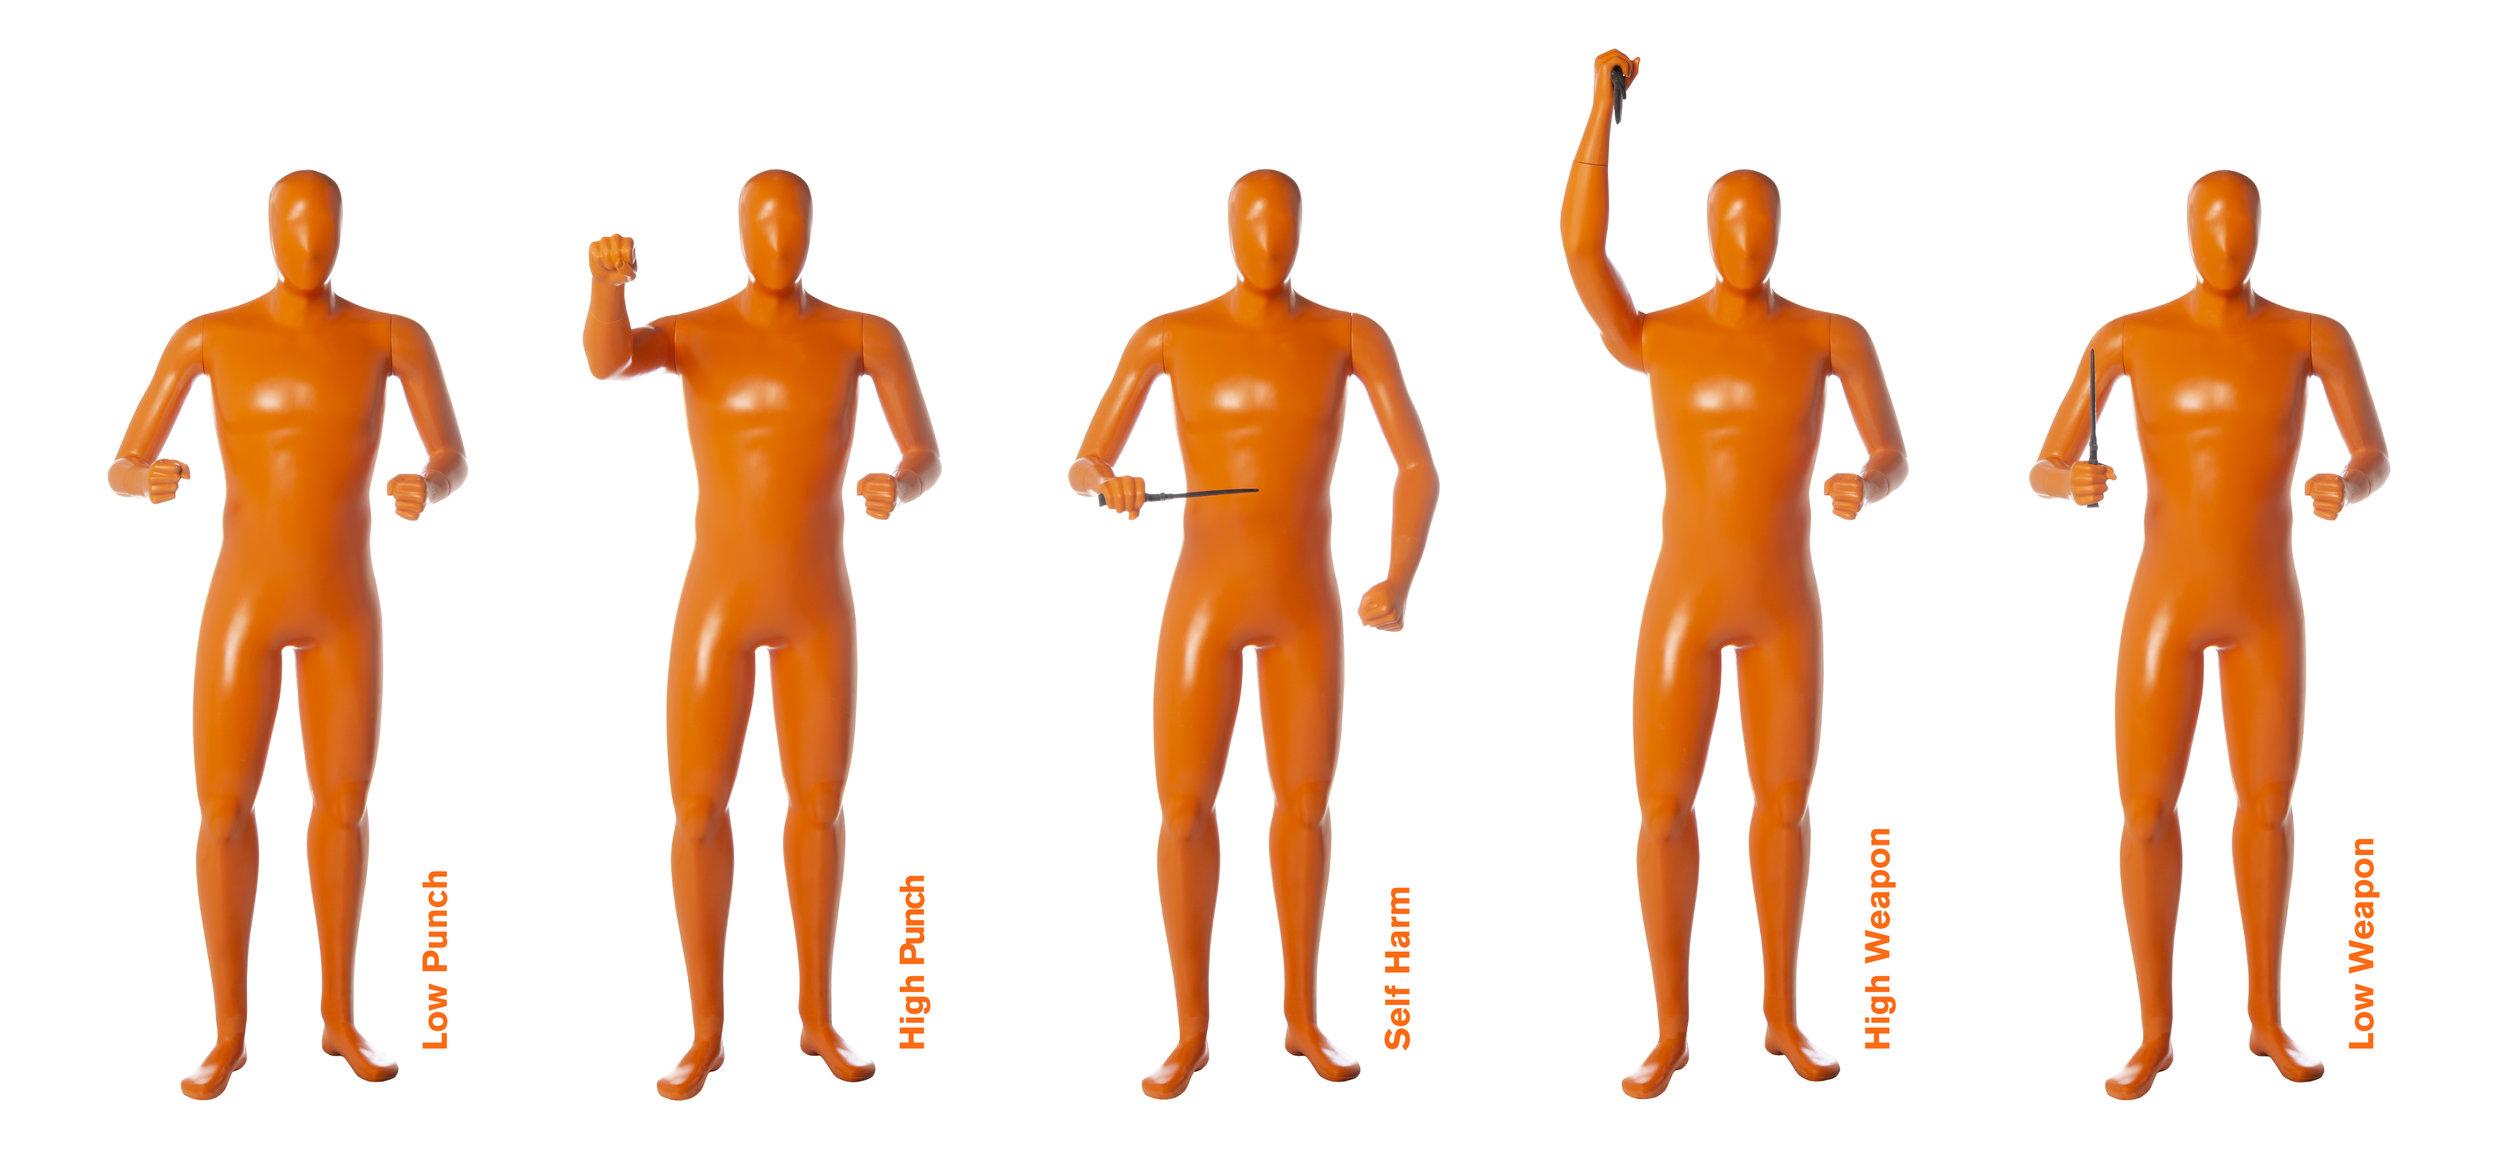 CCT_mannequin_position.jpg